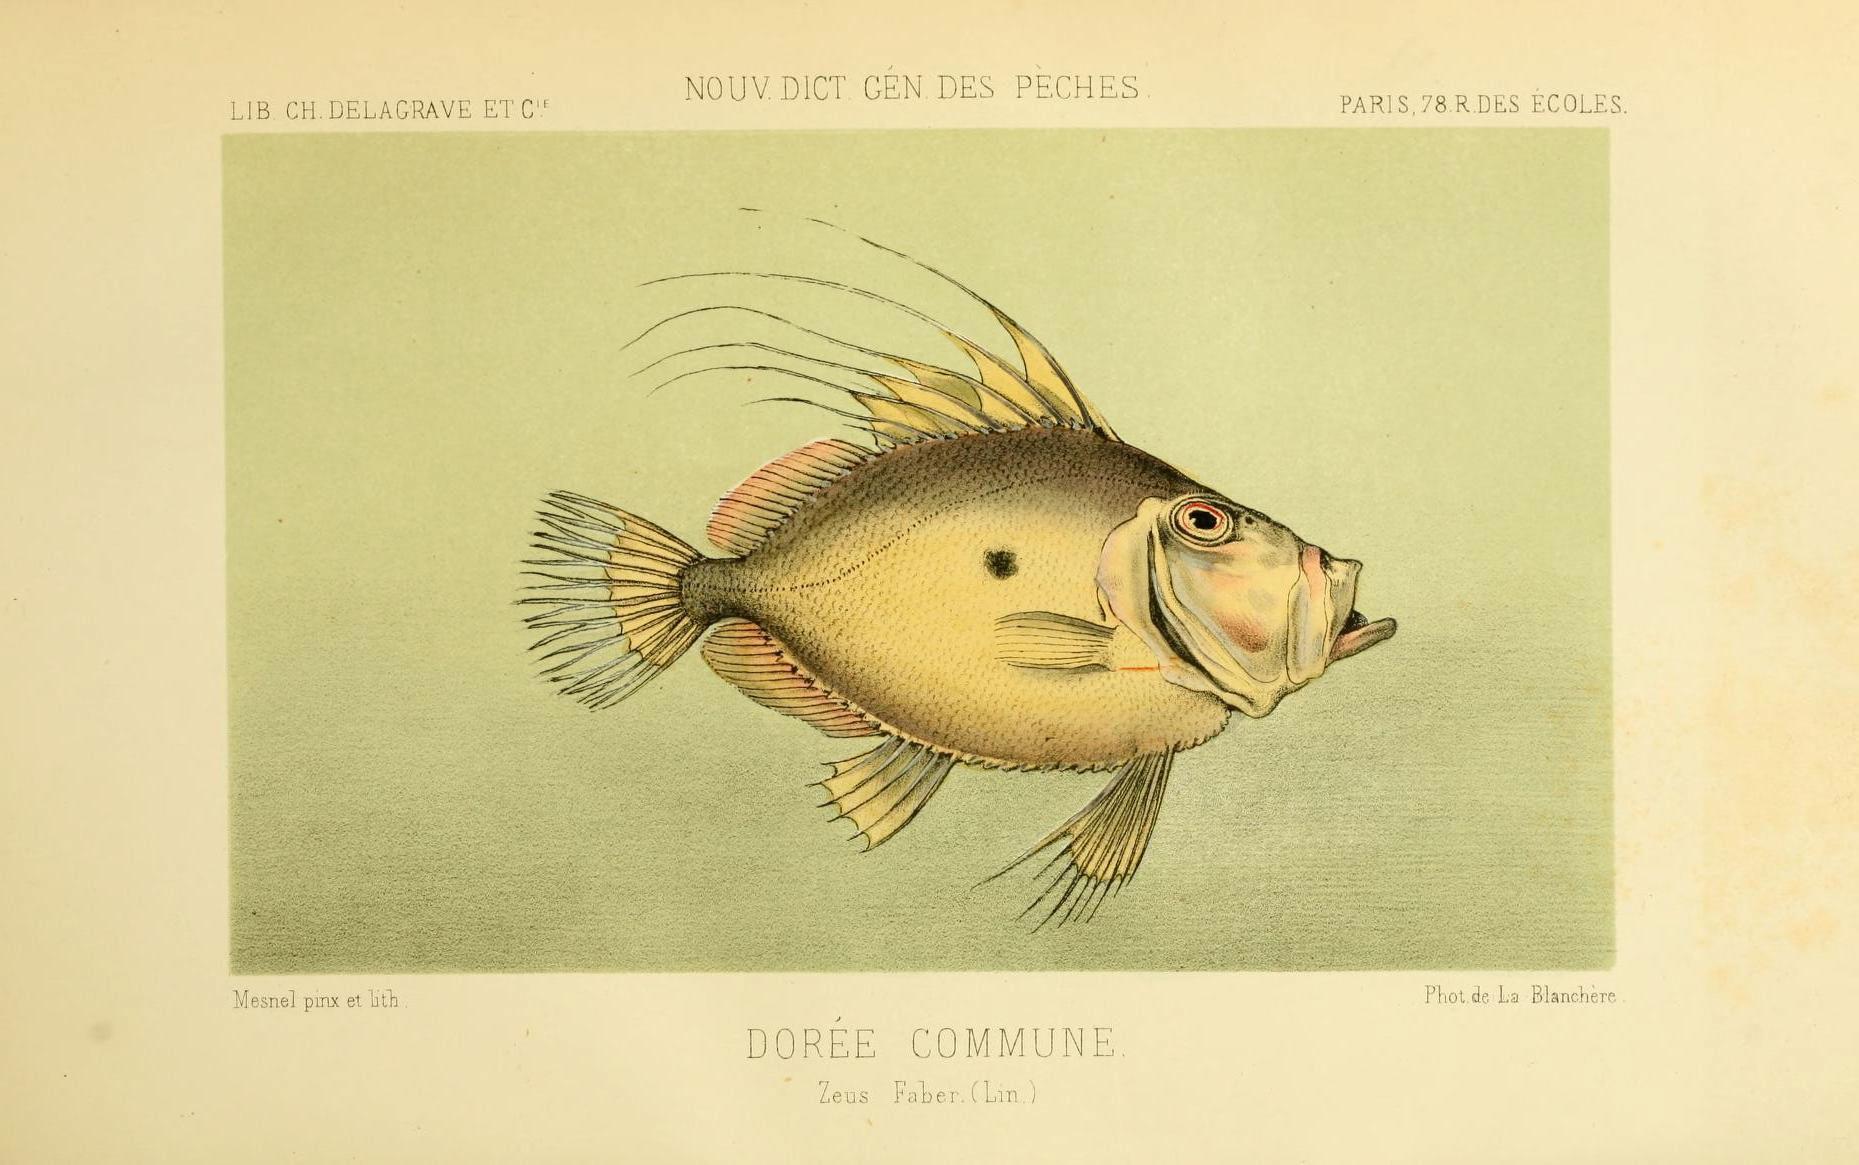 Image of John Dory